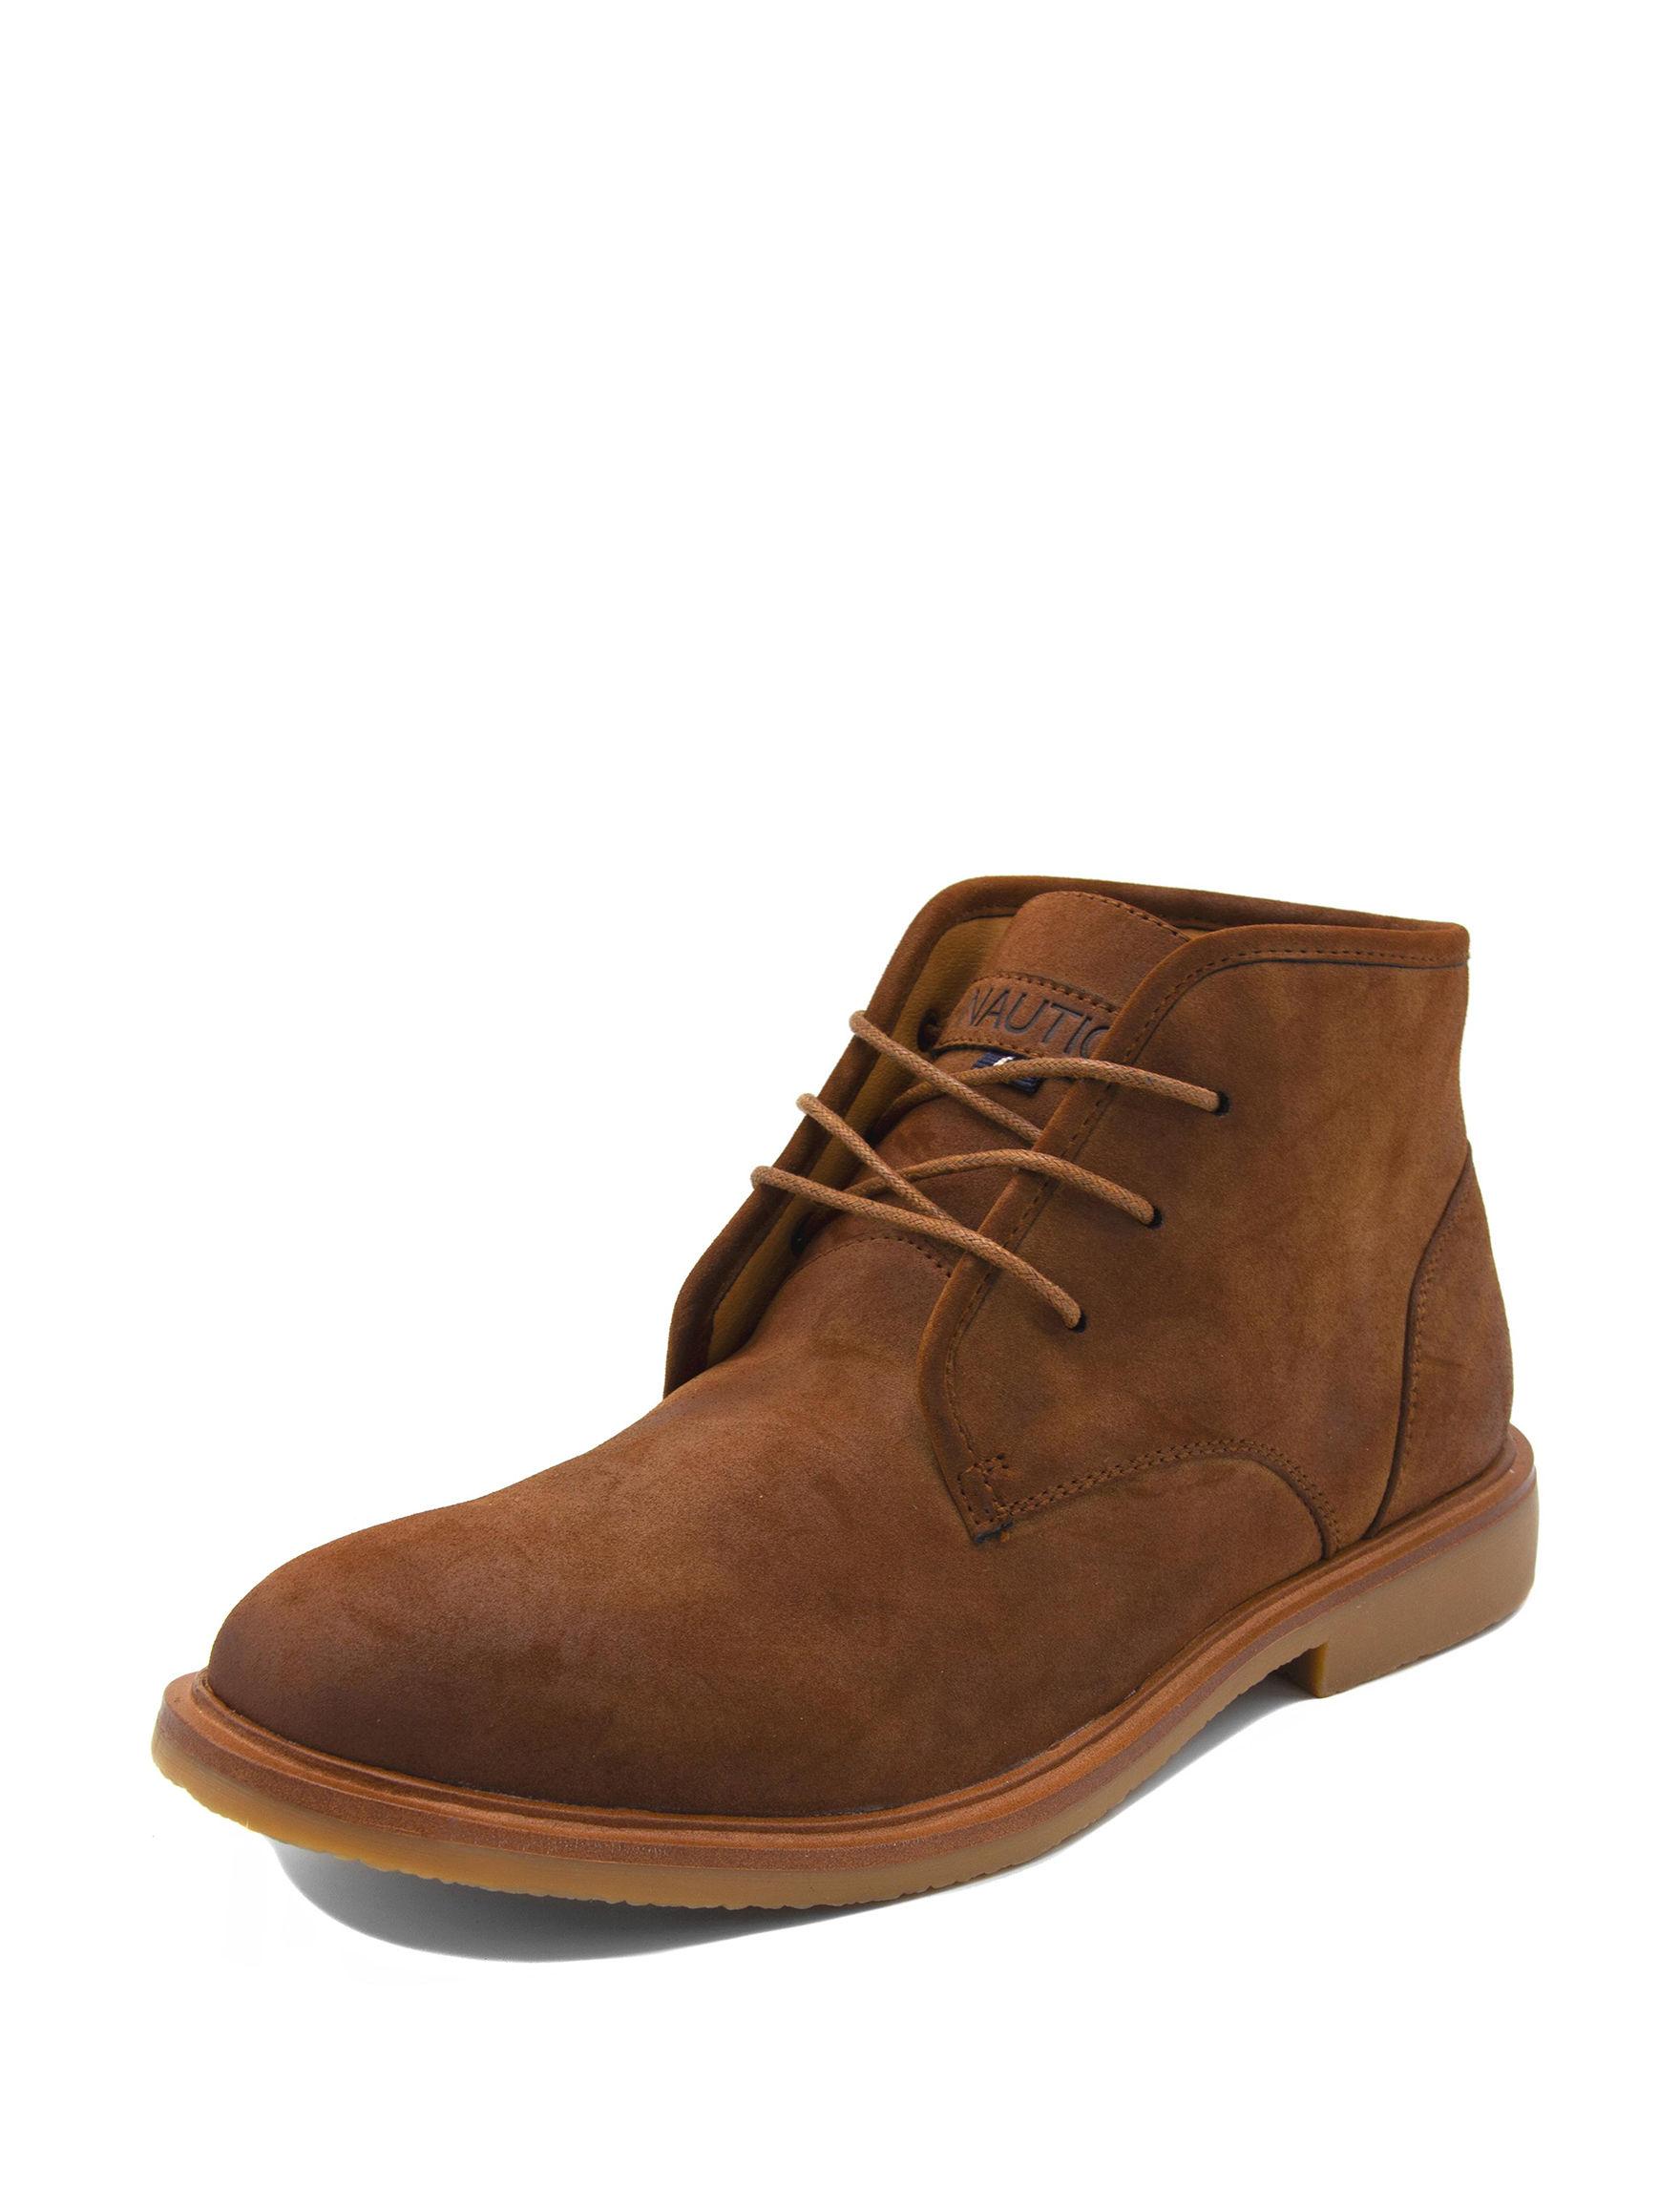 Nautica Brown Chukka Boots